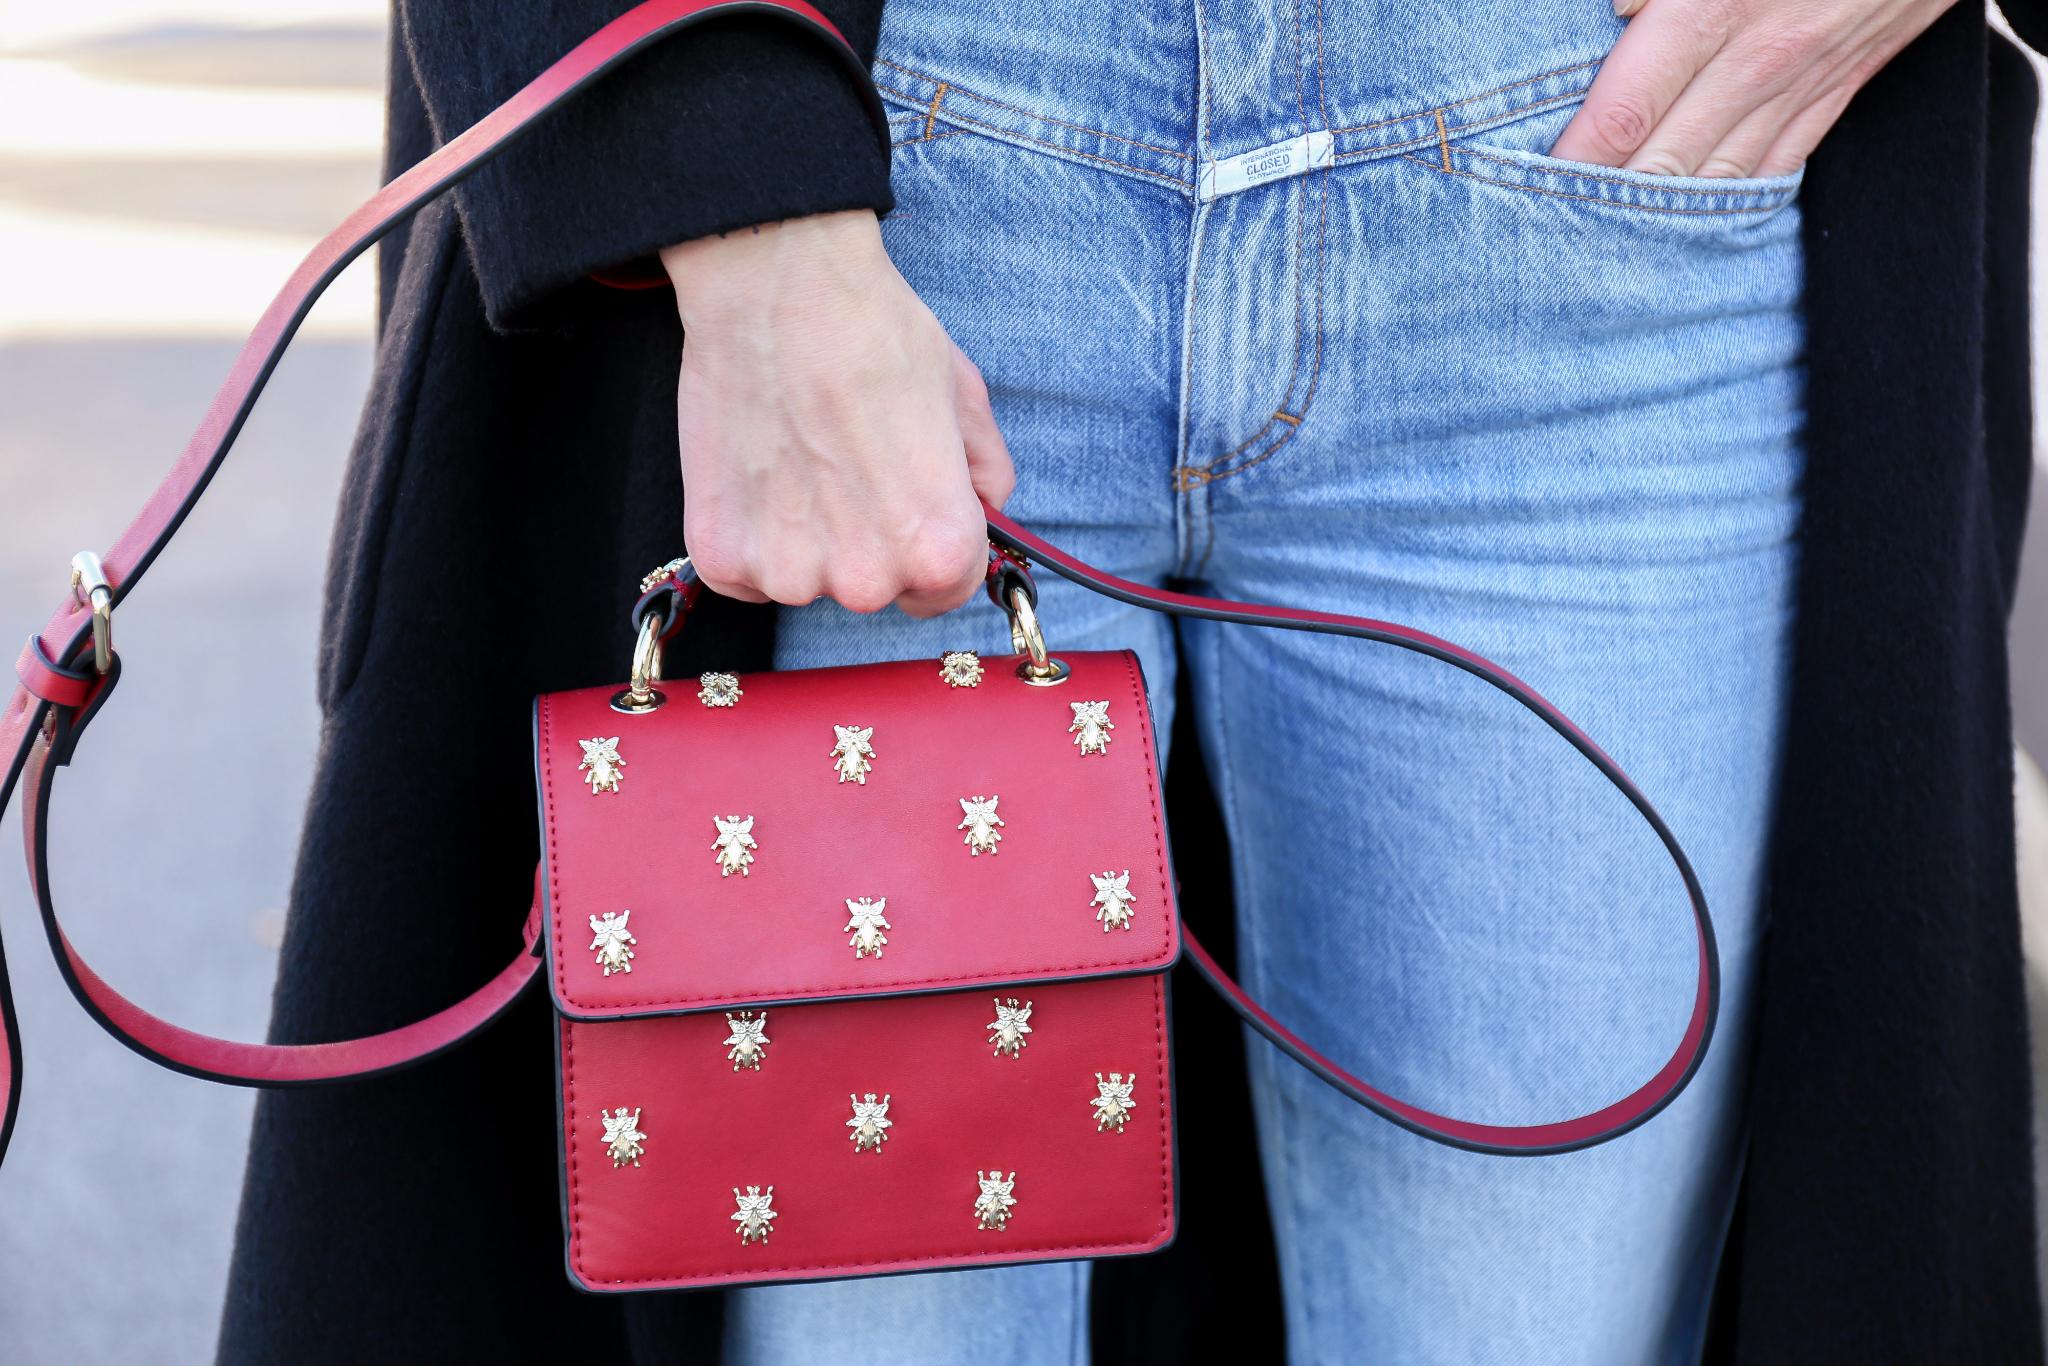 MOD-by-Monique-Fashion-Looks-Closed-Tiny-Beetle-Bag-23